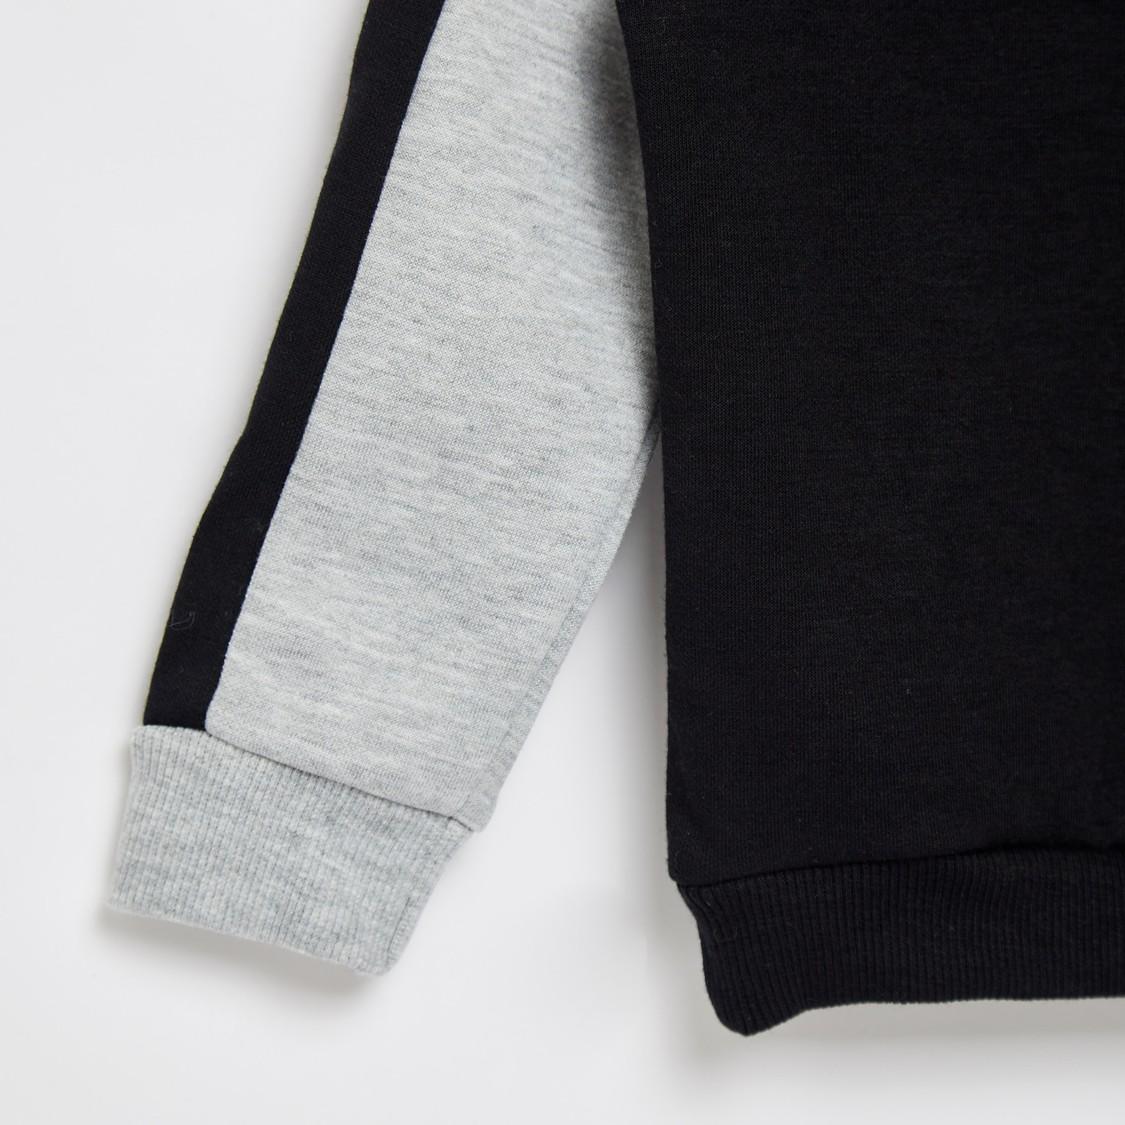 Typographic Print Hoodie with Long Sleeves and Kangaroo Pockets